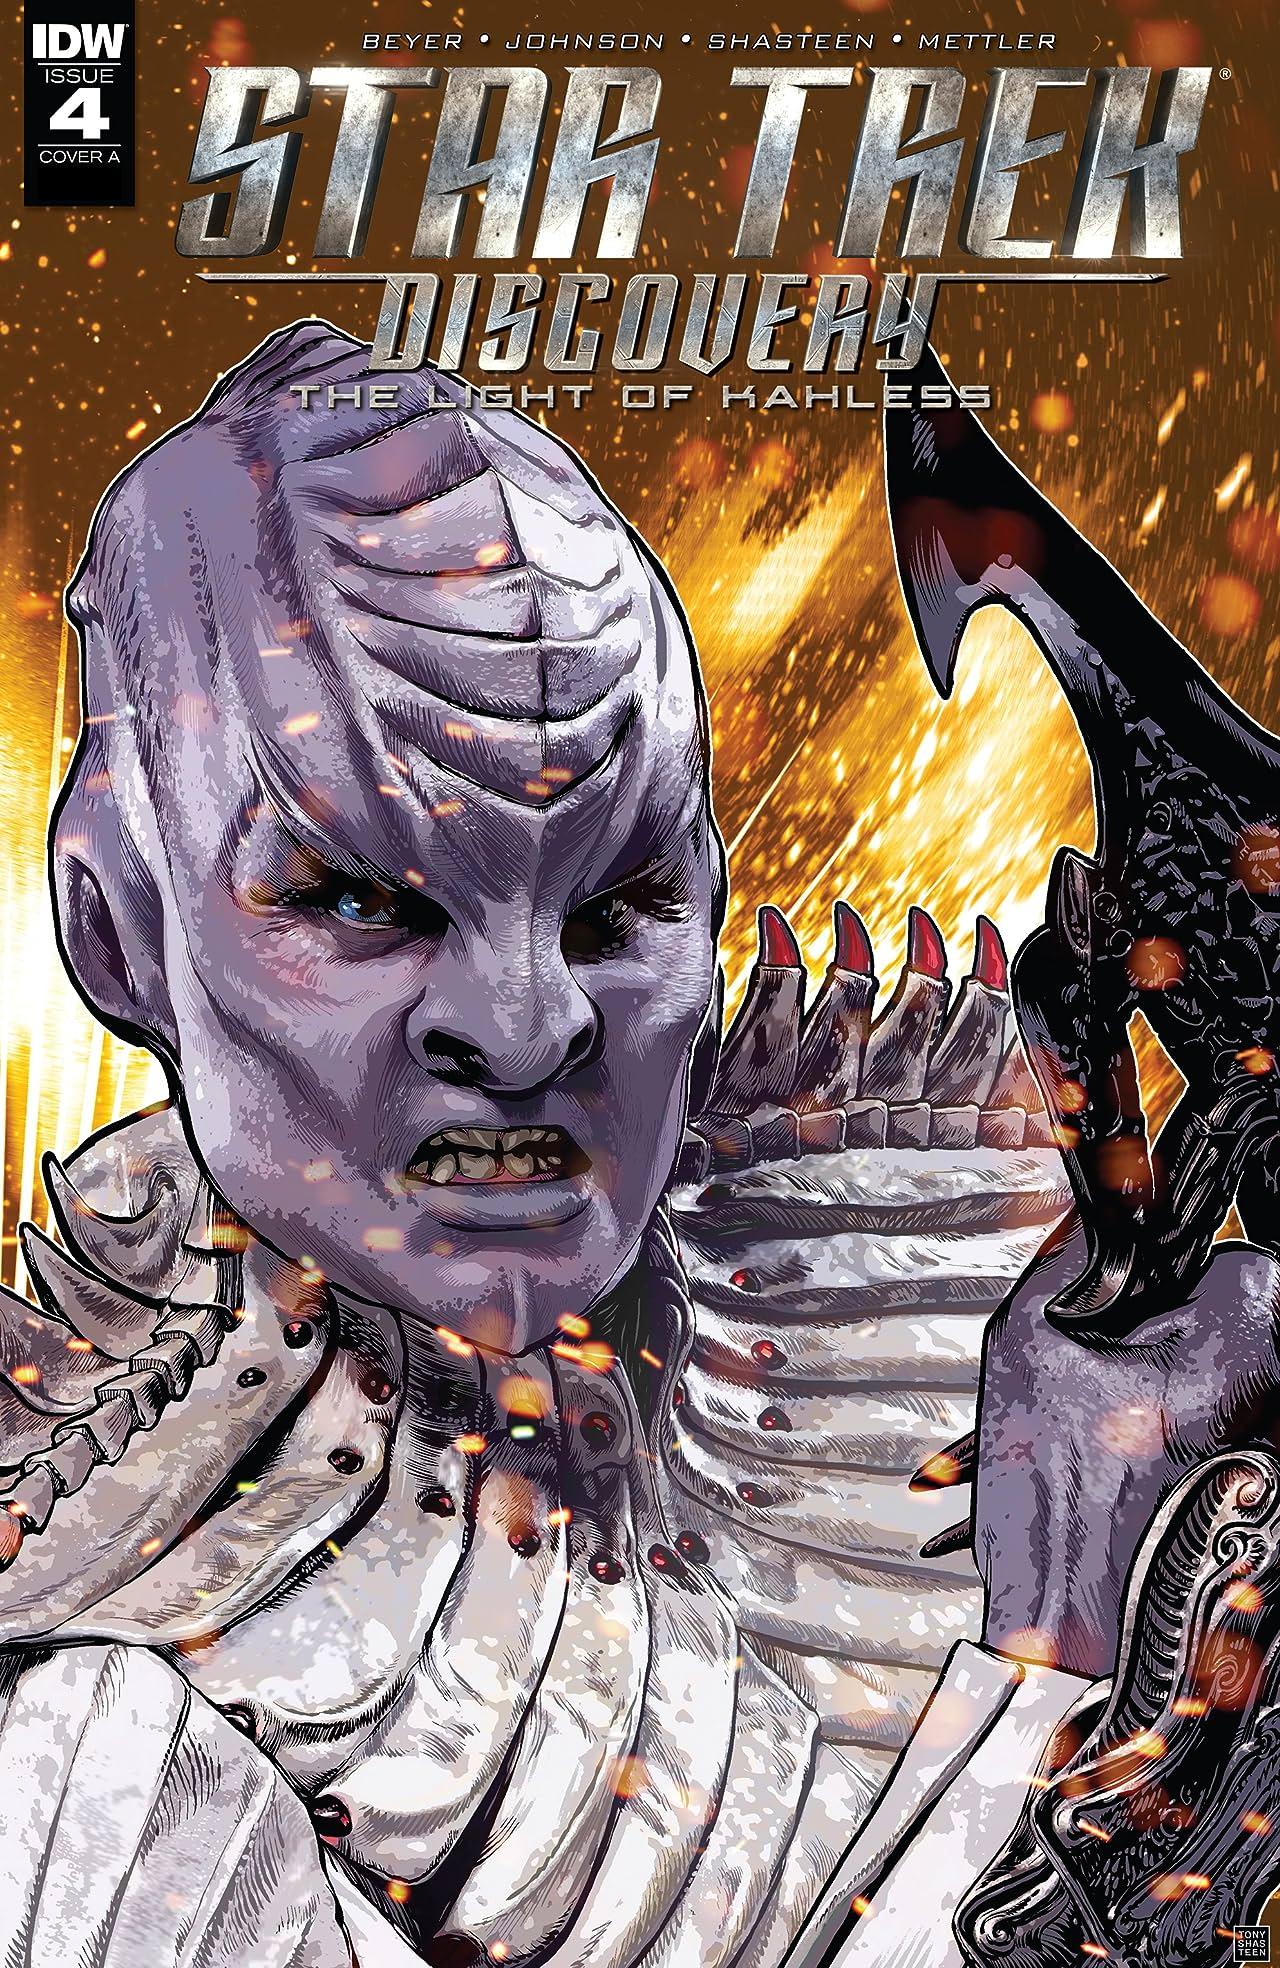 Star Trek: Discovery #4